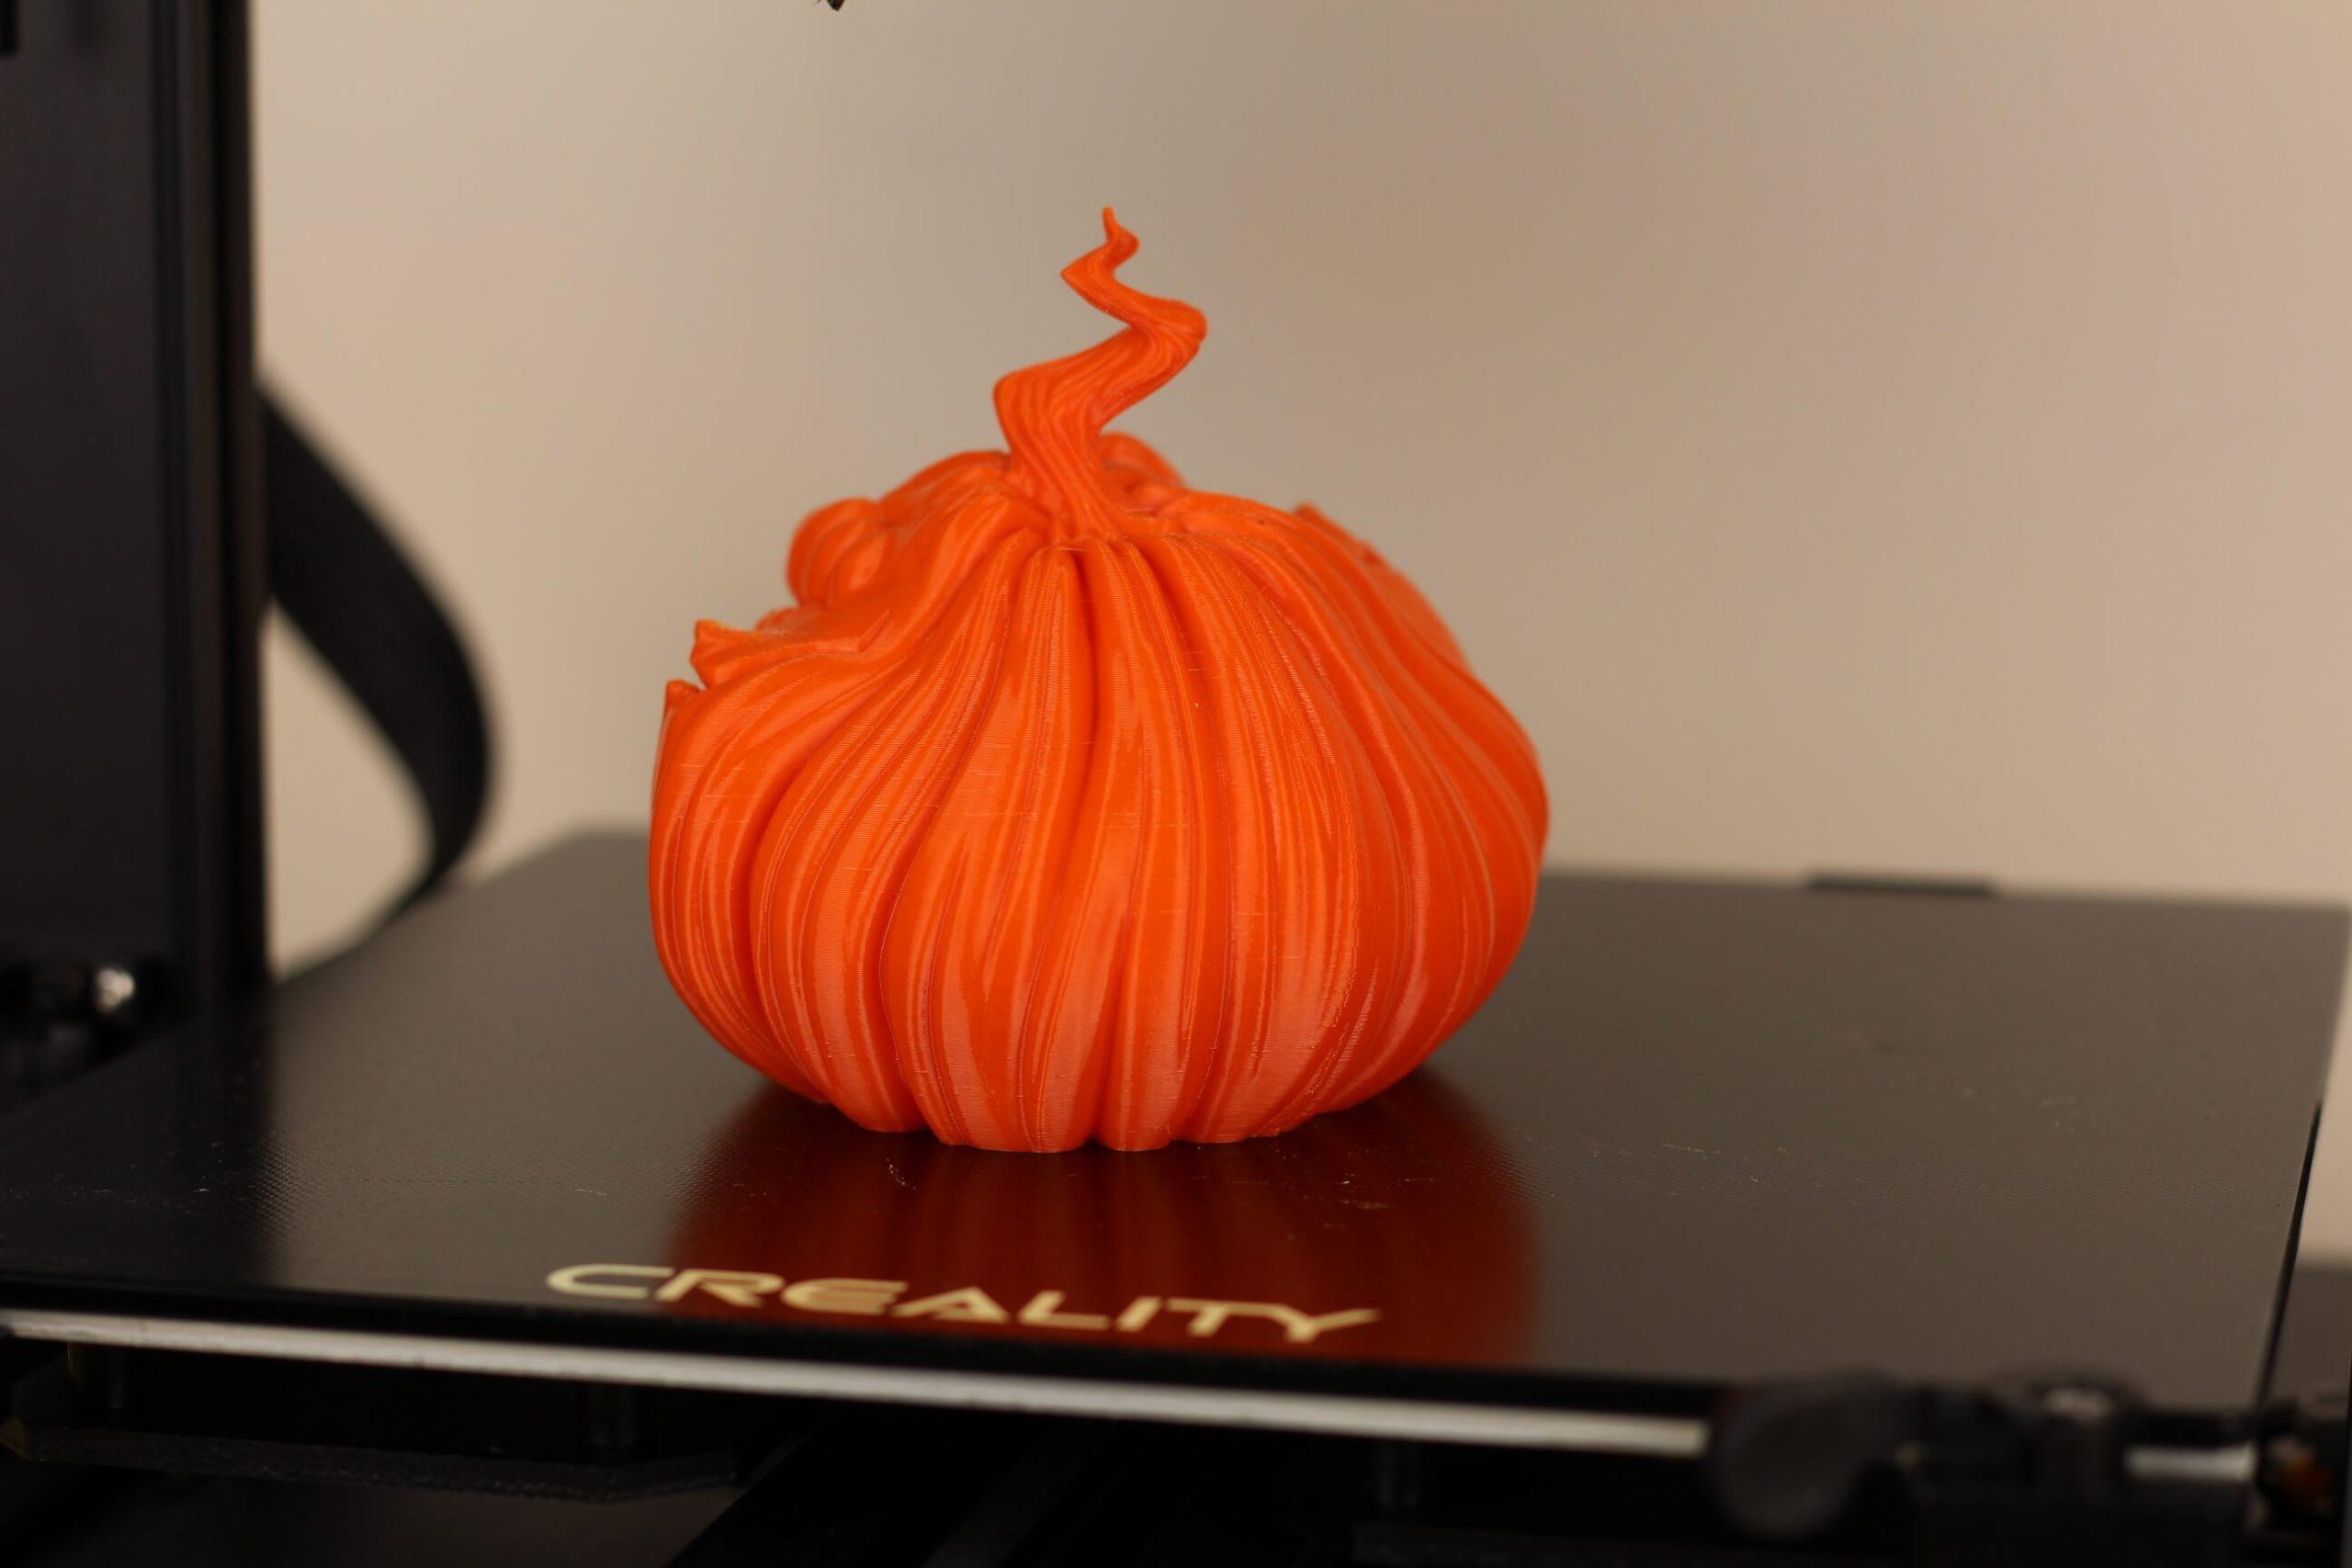 Grinning-Pumpkin-PETG-print-on-CR-6-SE-4